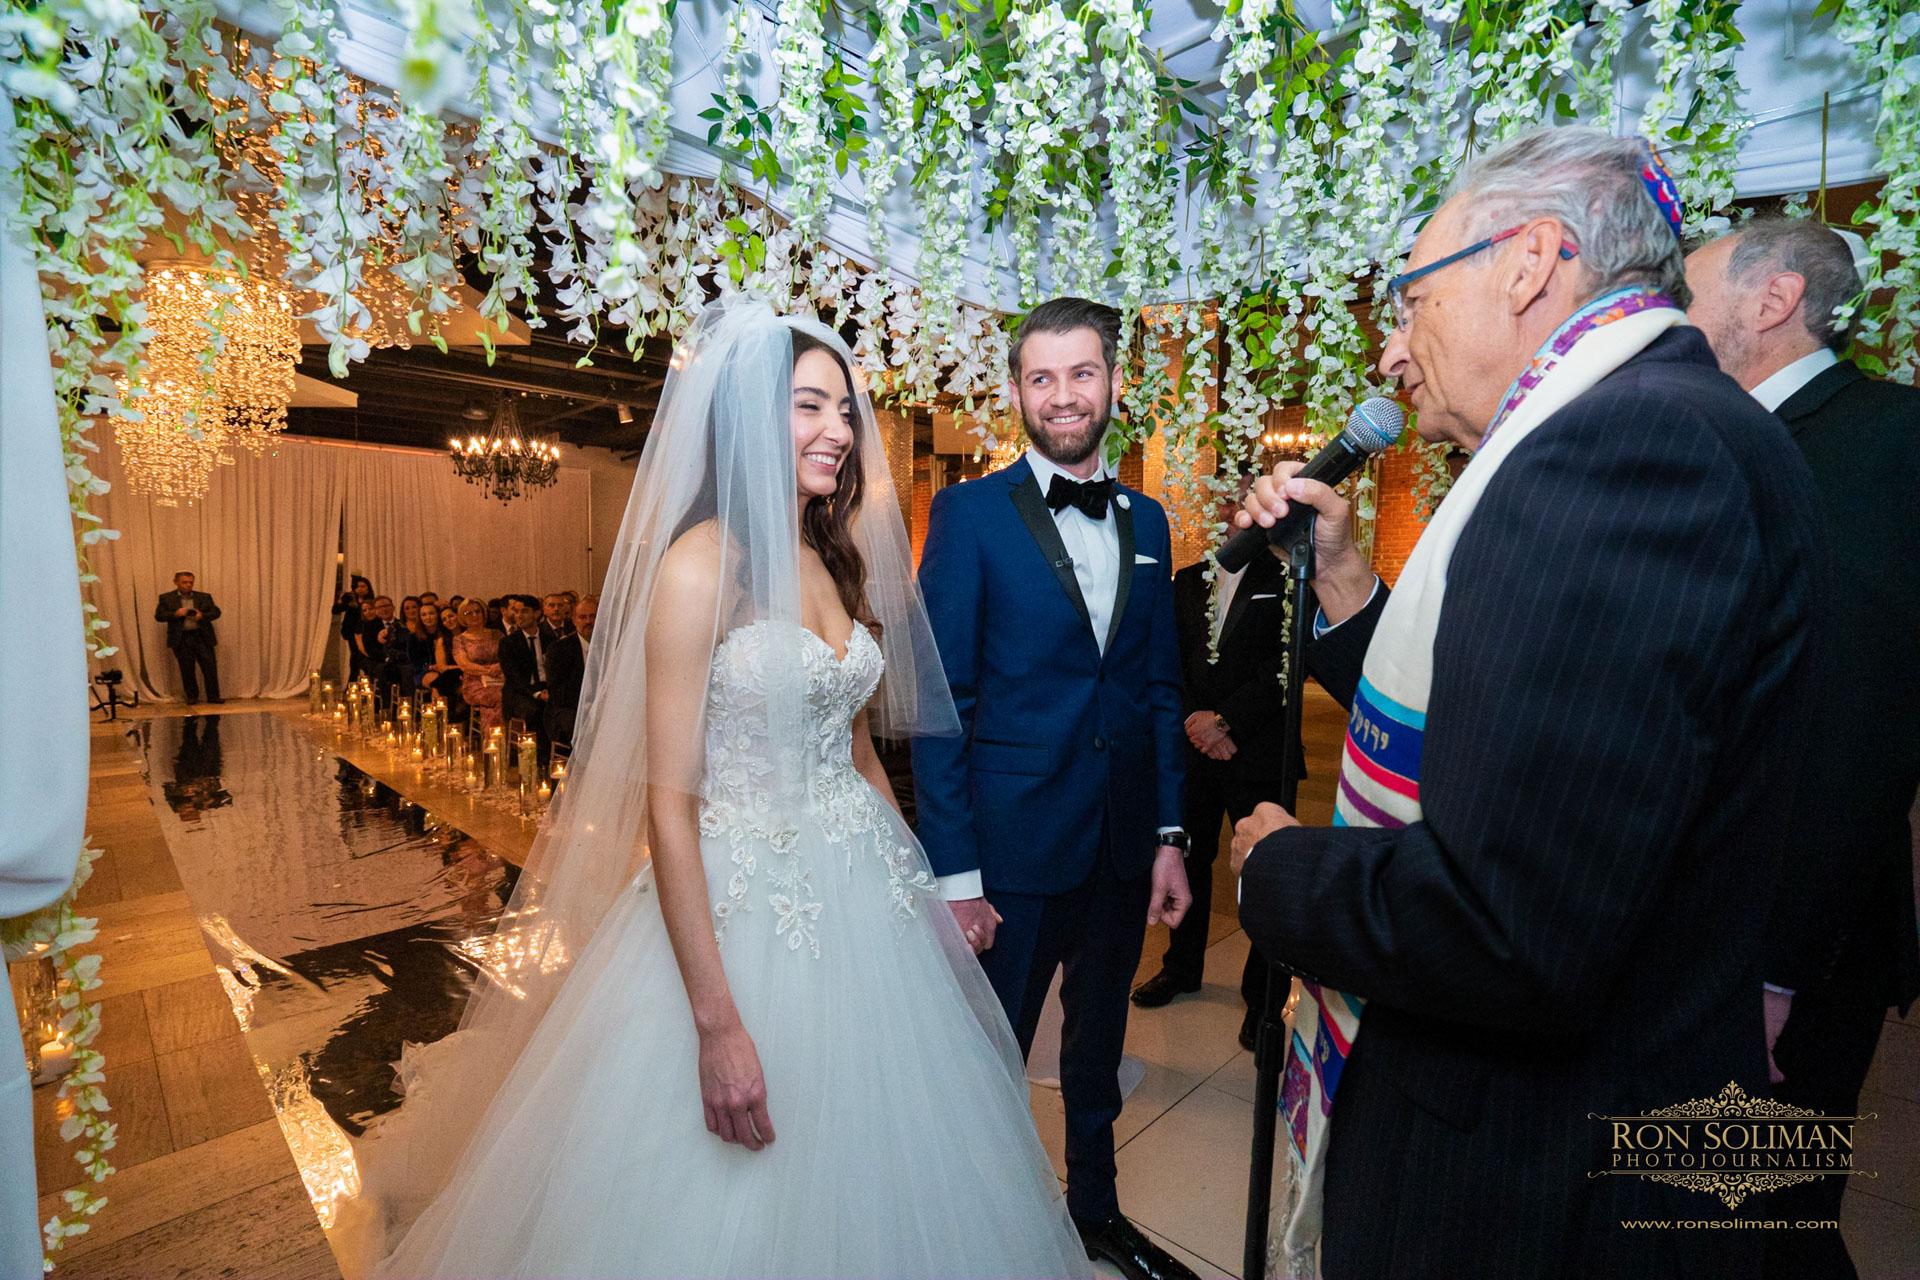 TENDENZA WEDDING 337